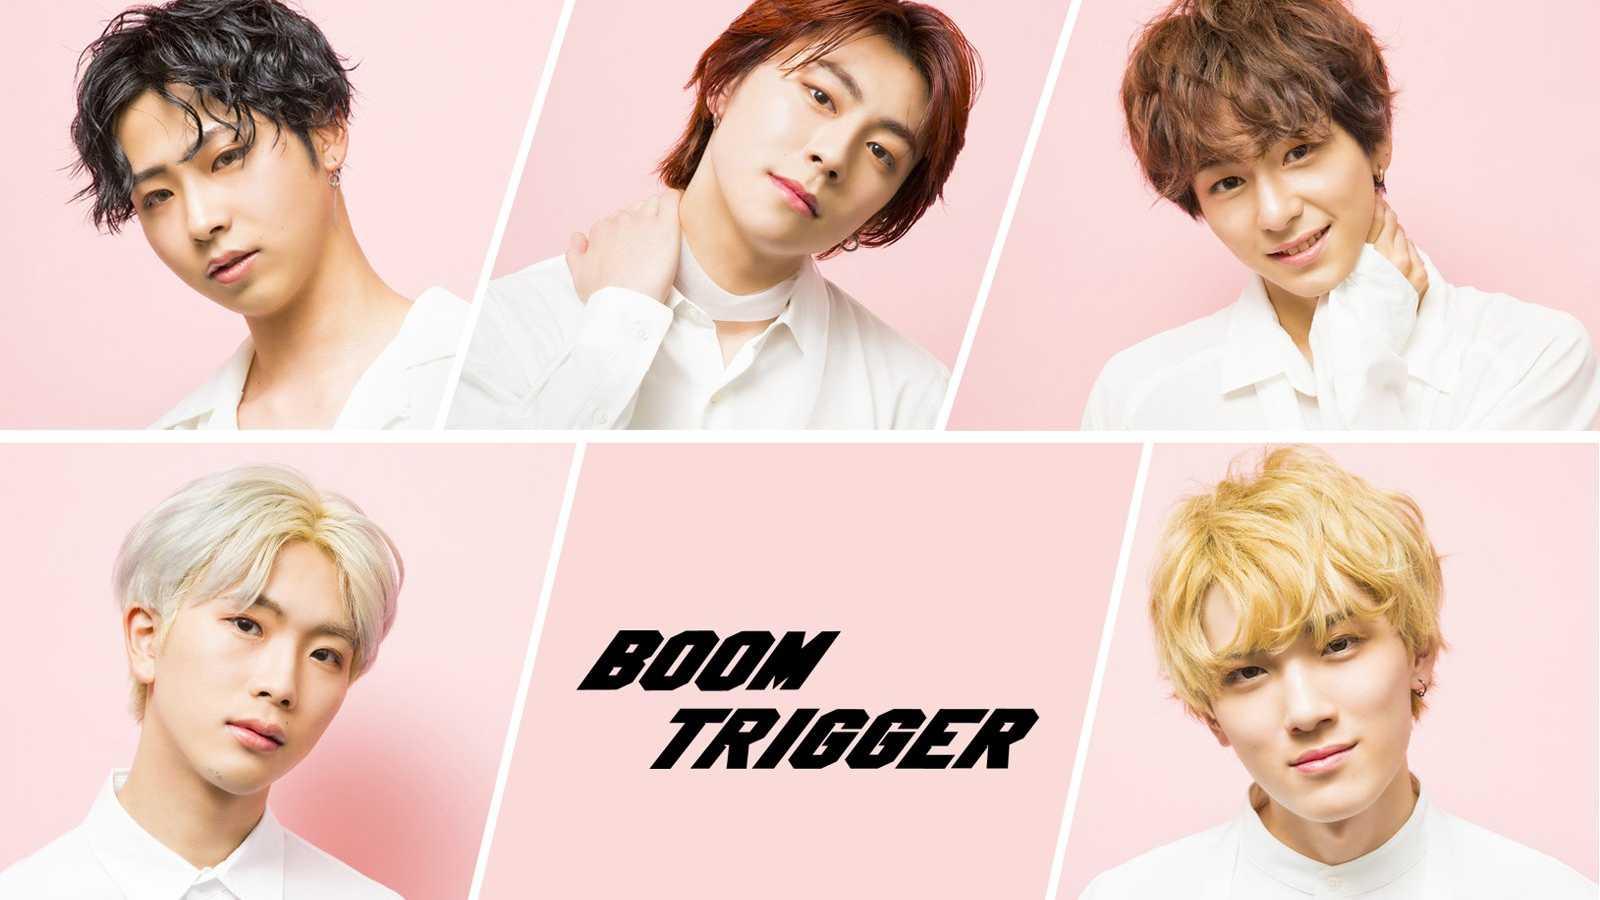 Boom Trigger © Boom Trigger